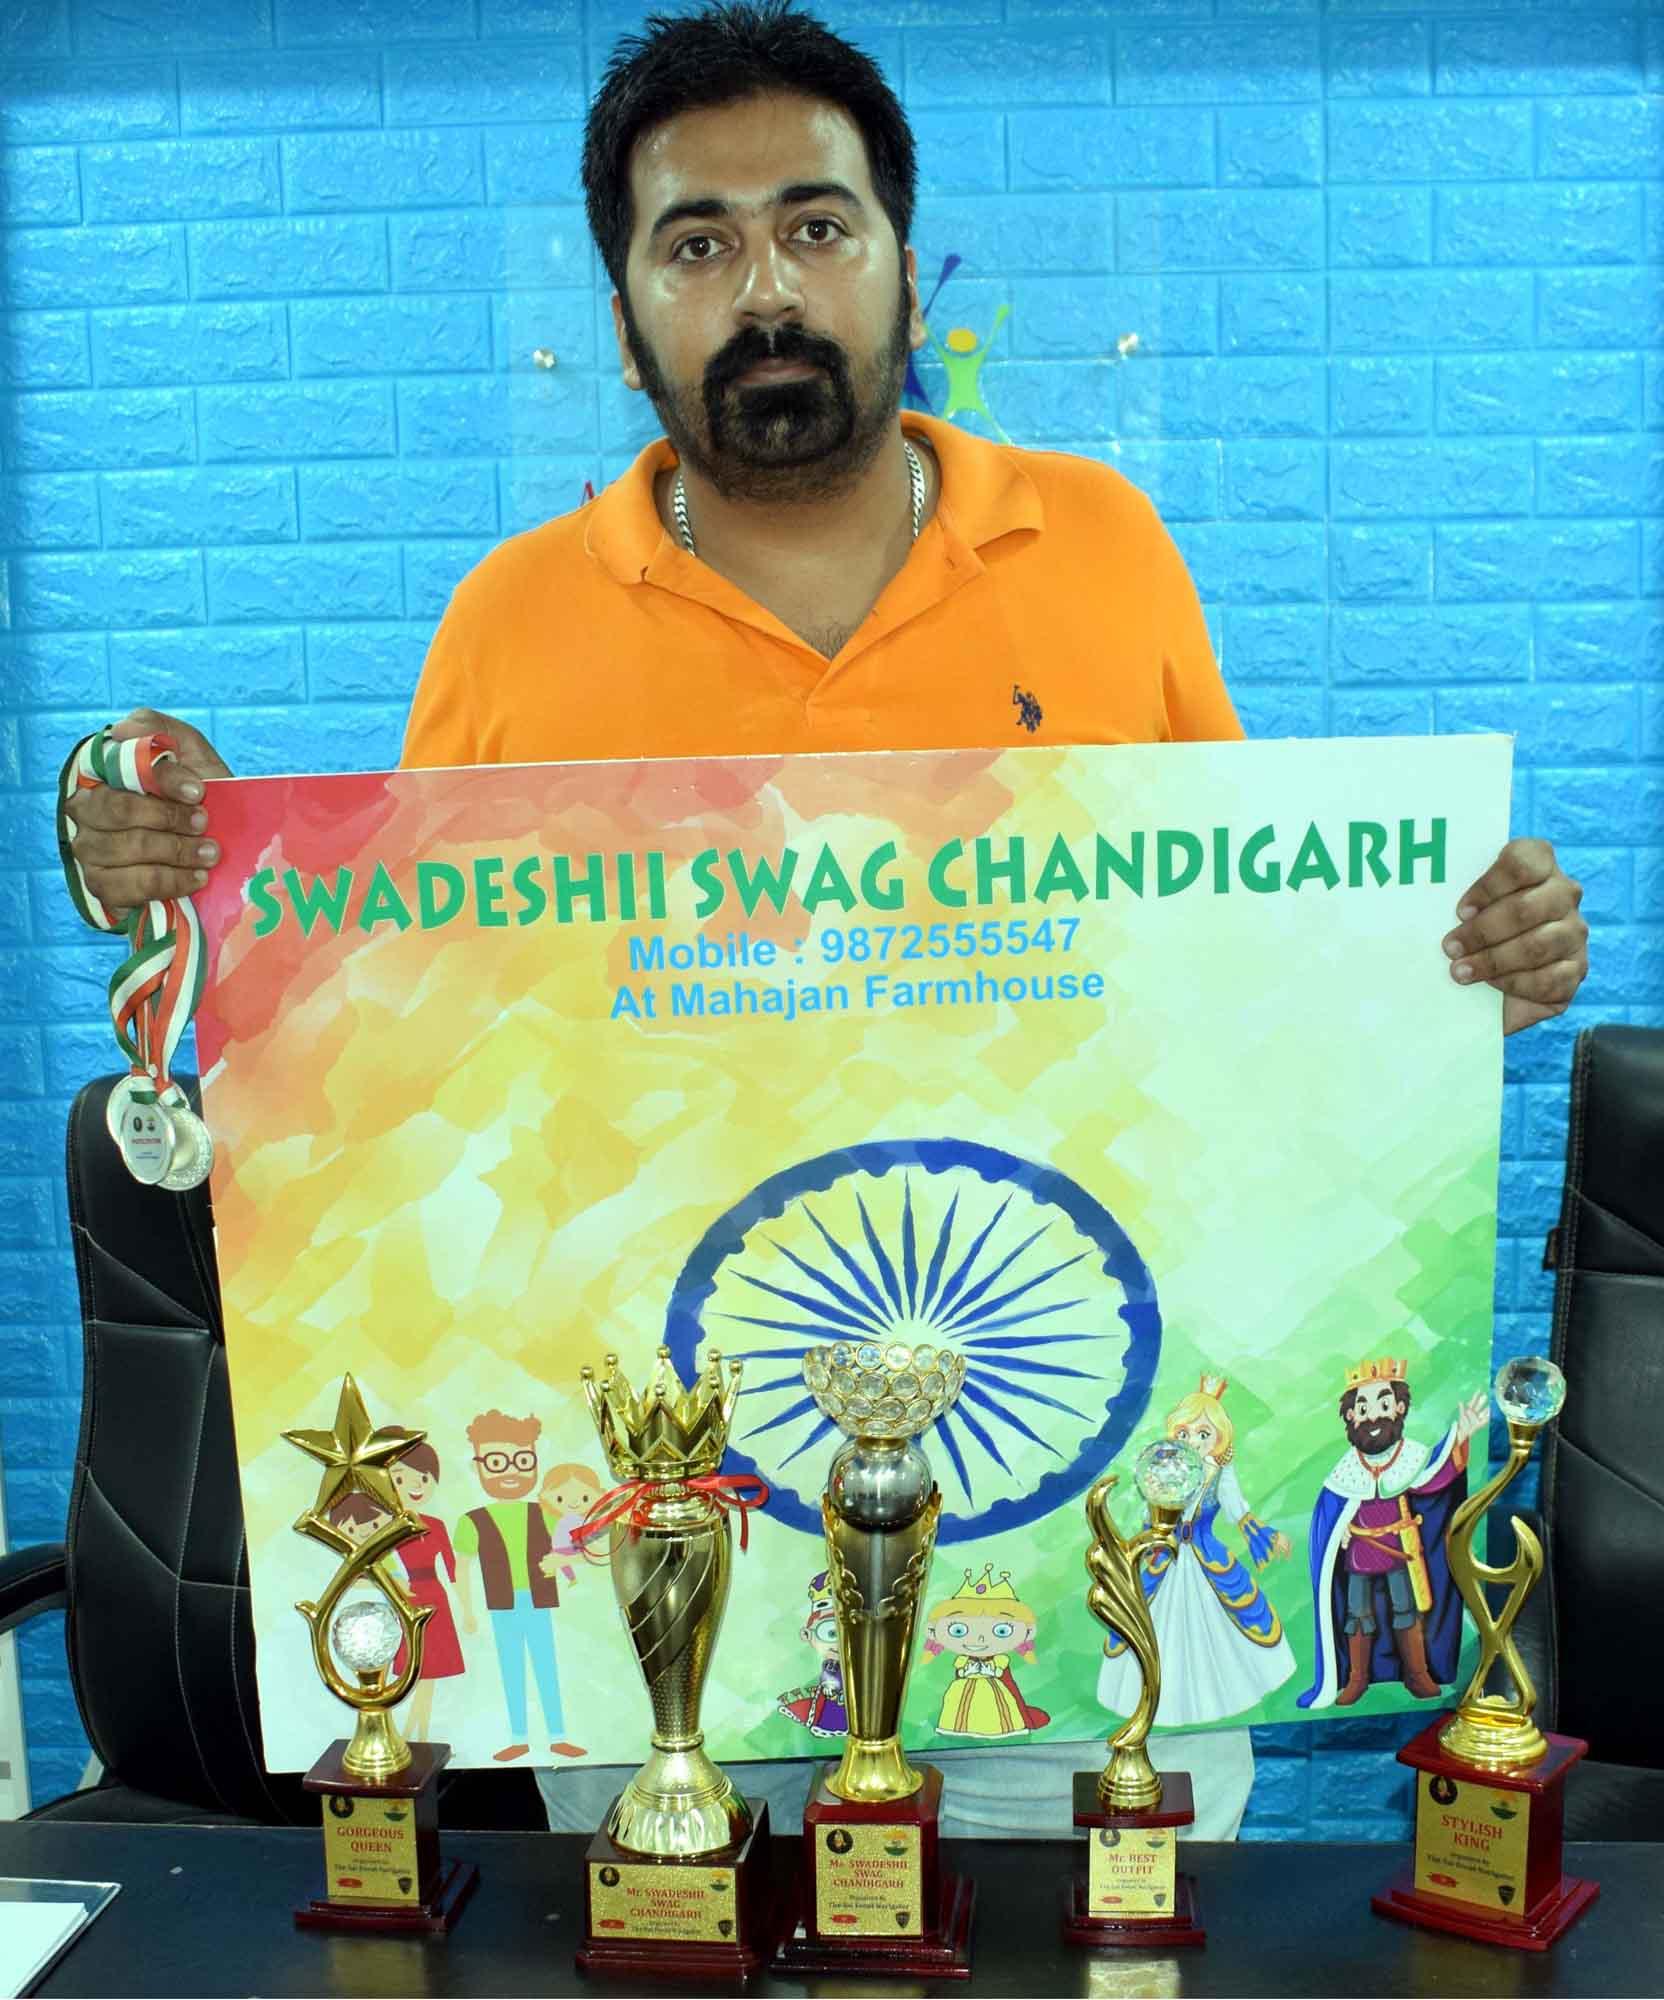 The Swadeshii Swag, Chandigarh Fashion Show